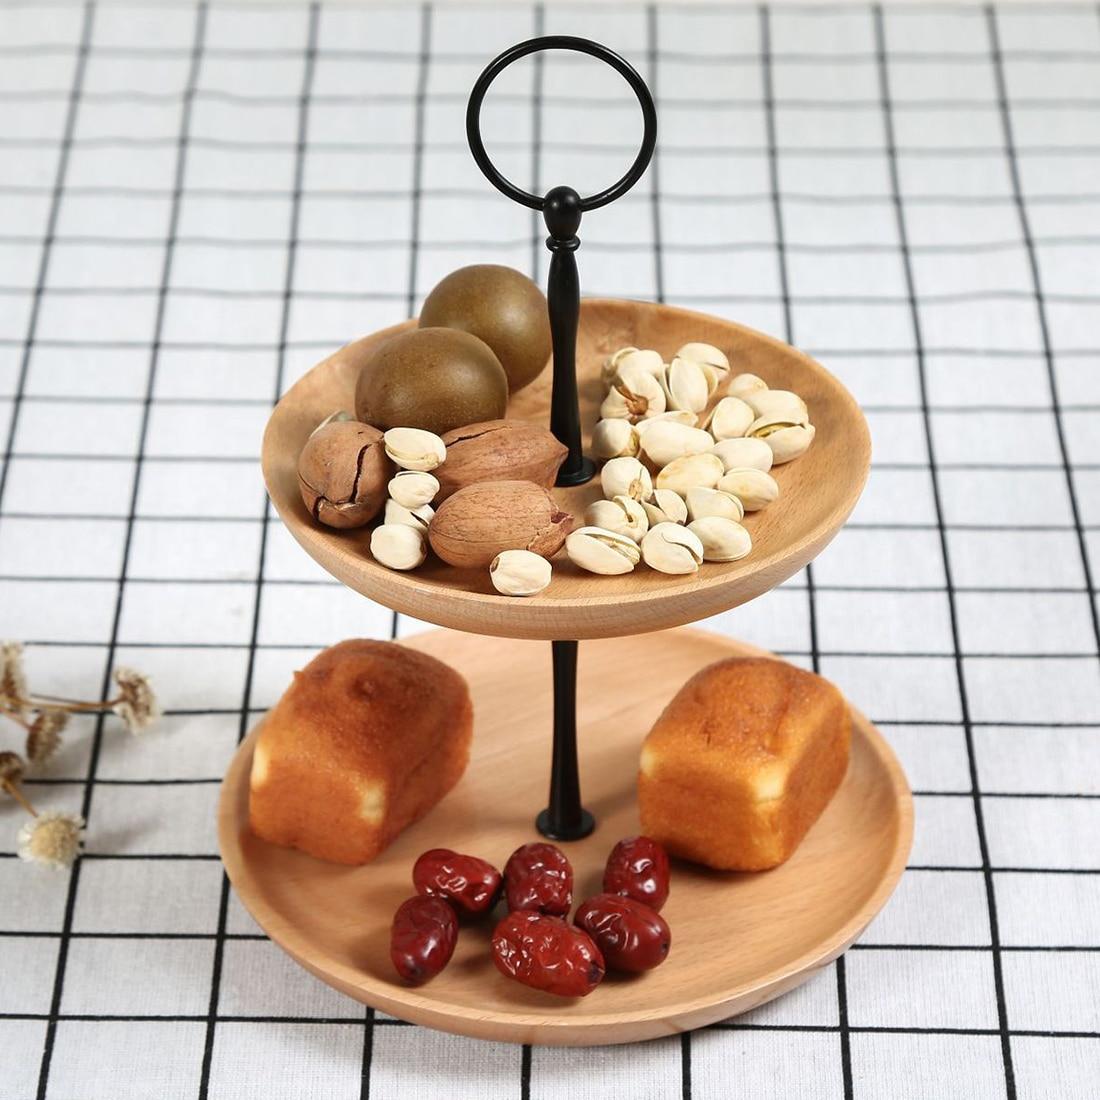 Unique en bois massif cake stand Cupcake Display Stand de fruits